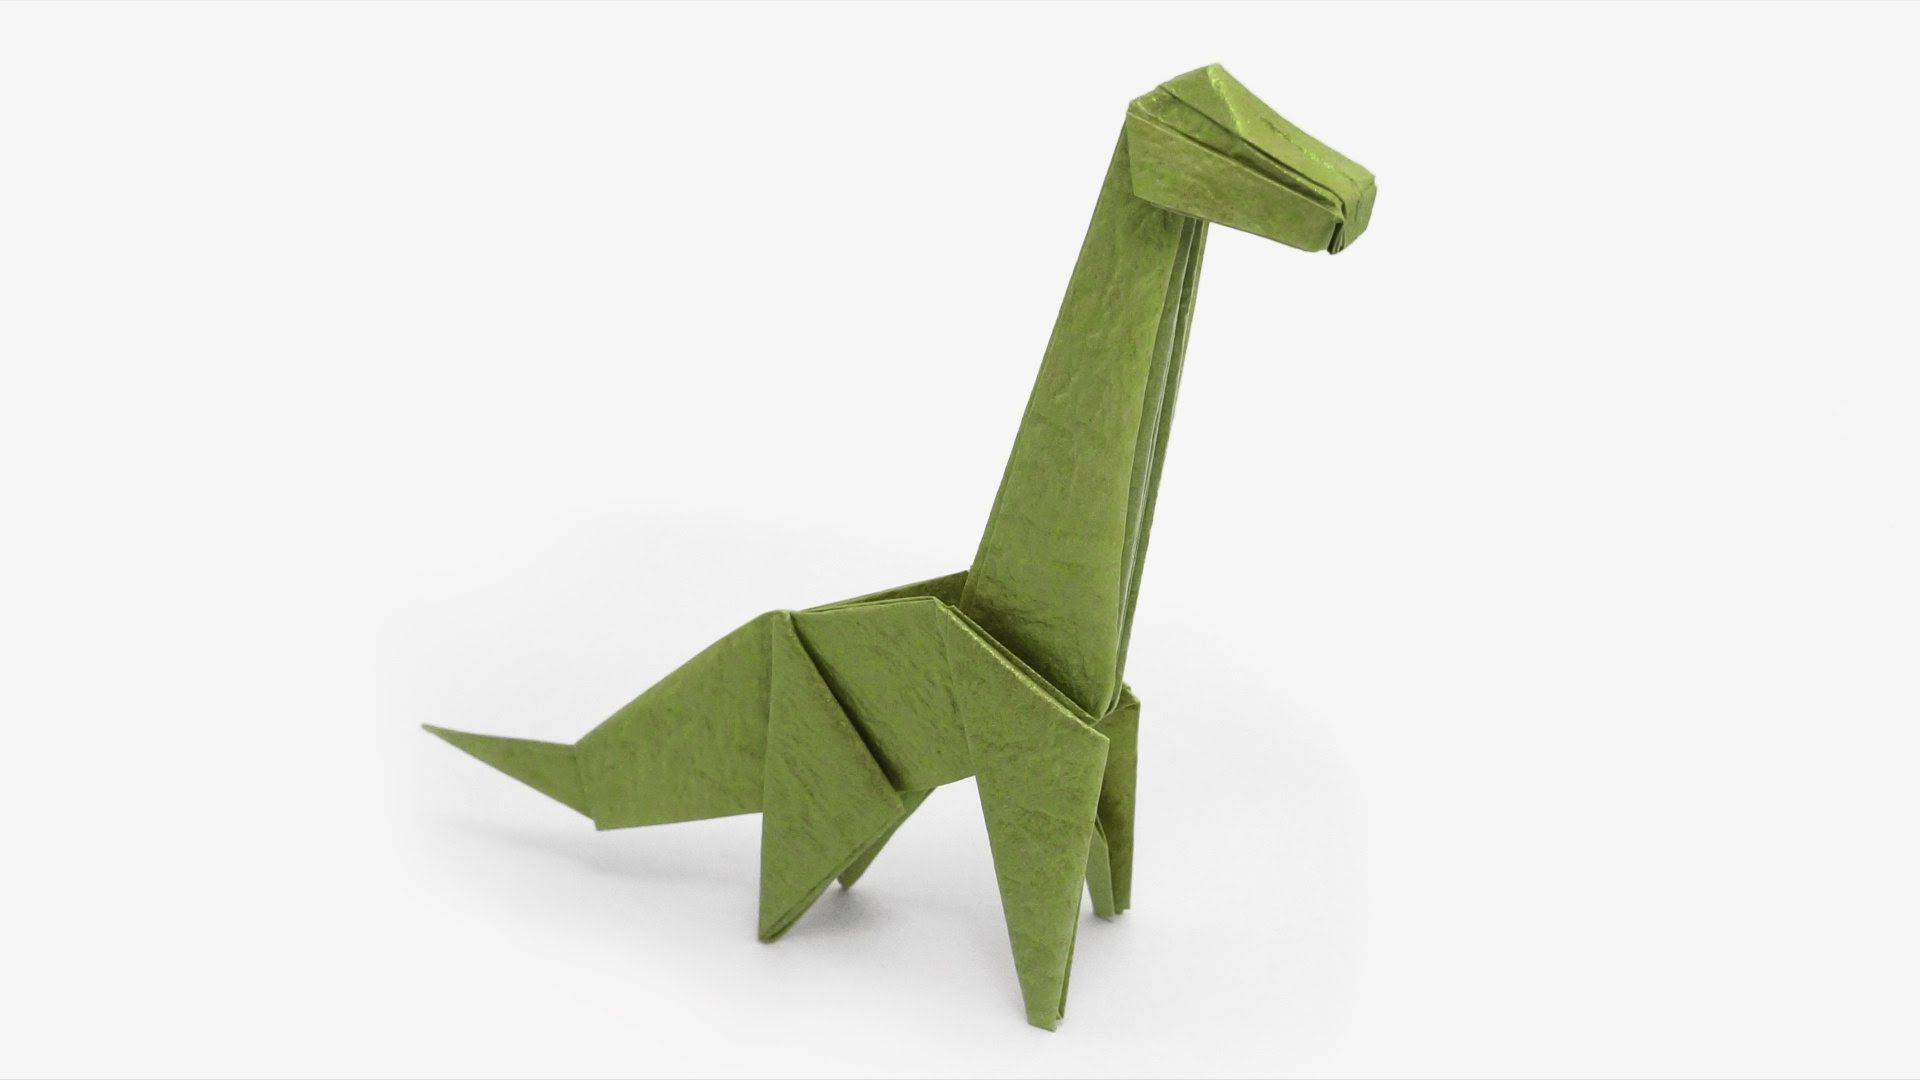 Origami Dinosaur - Brachiosaurus (Jo Nakashima) | ORIGAMI ... - photo#5